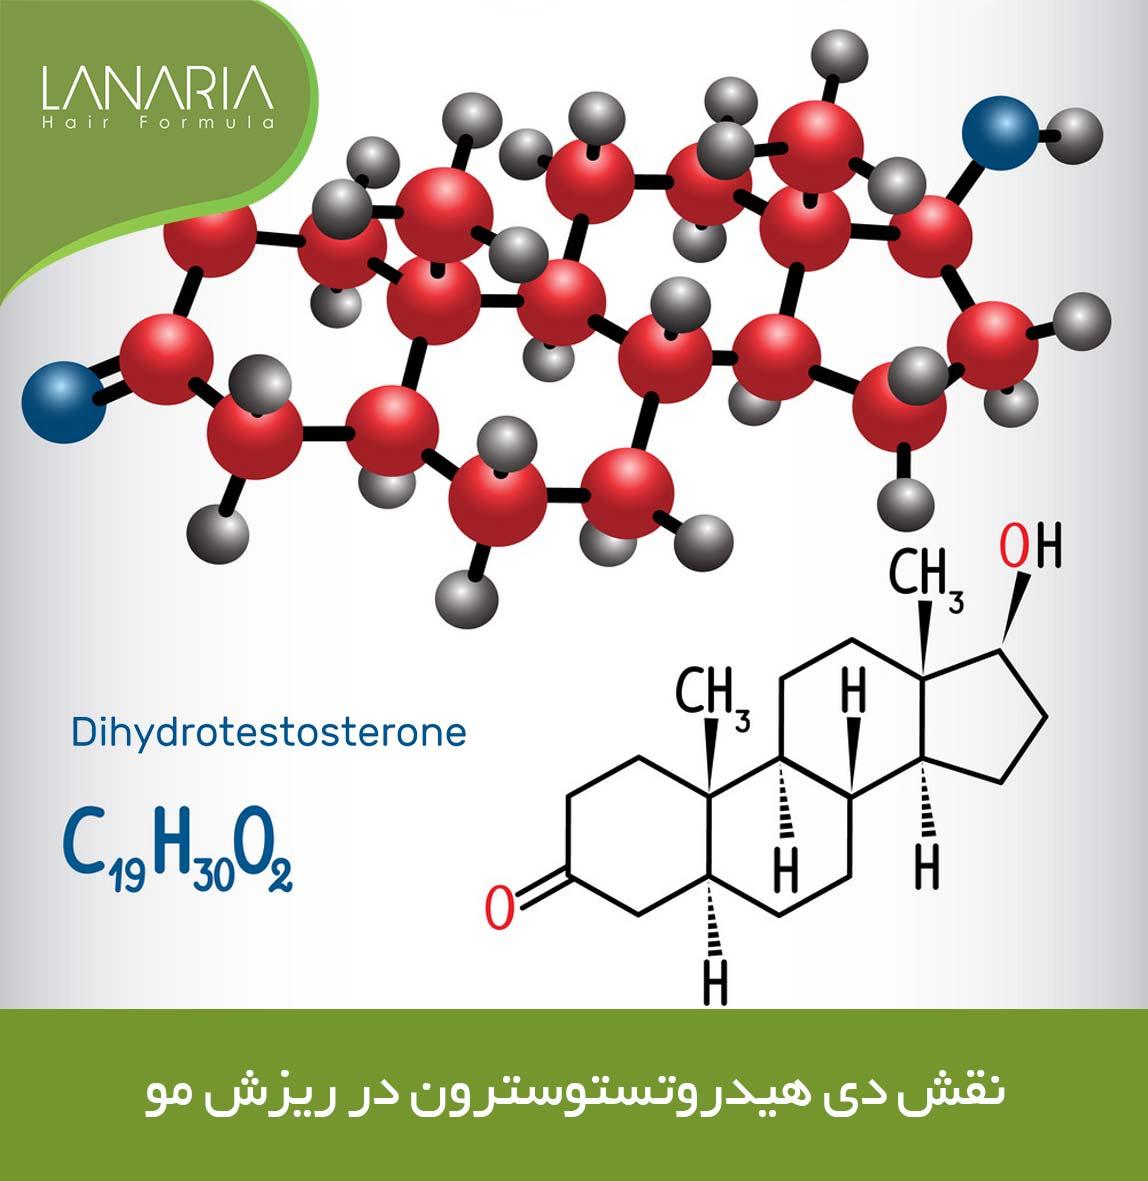 lanaria- نقش دی هیدروتستوسترون